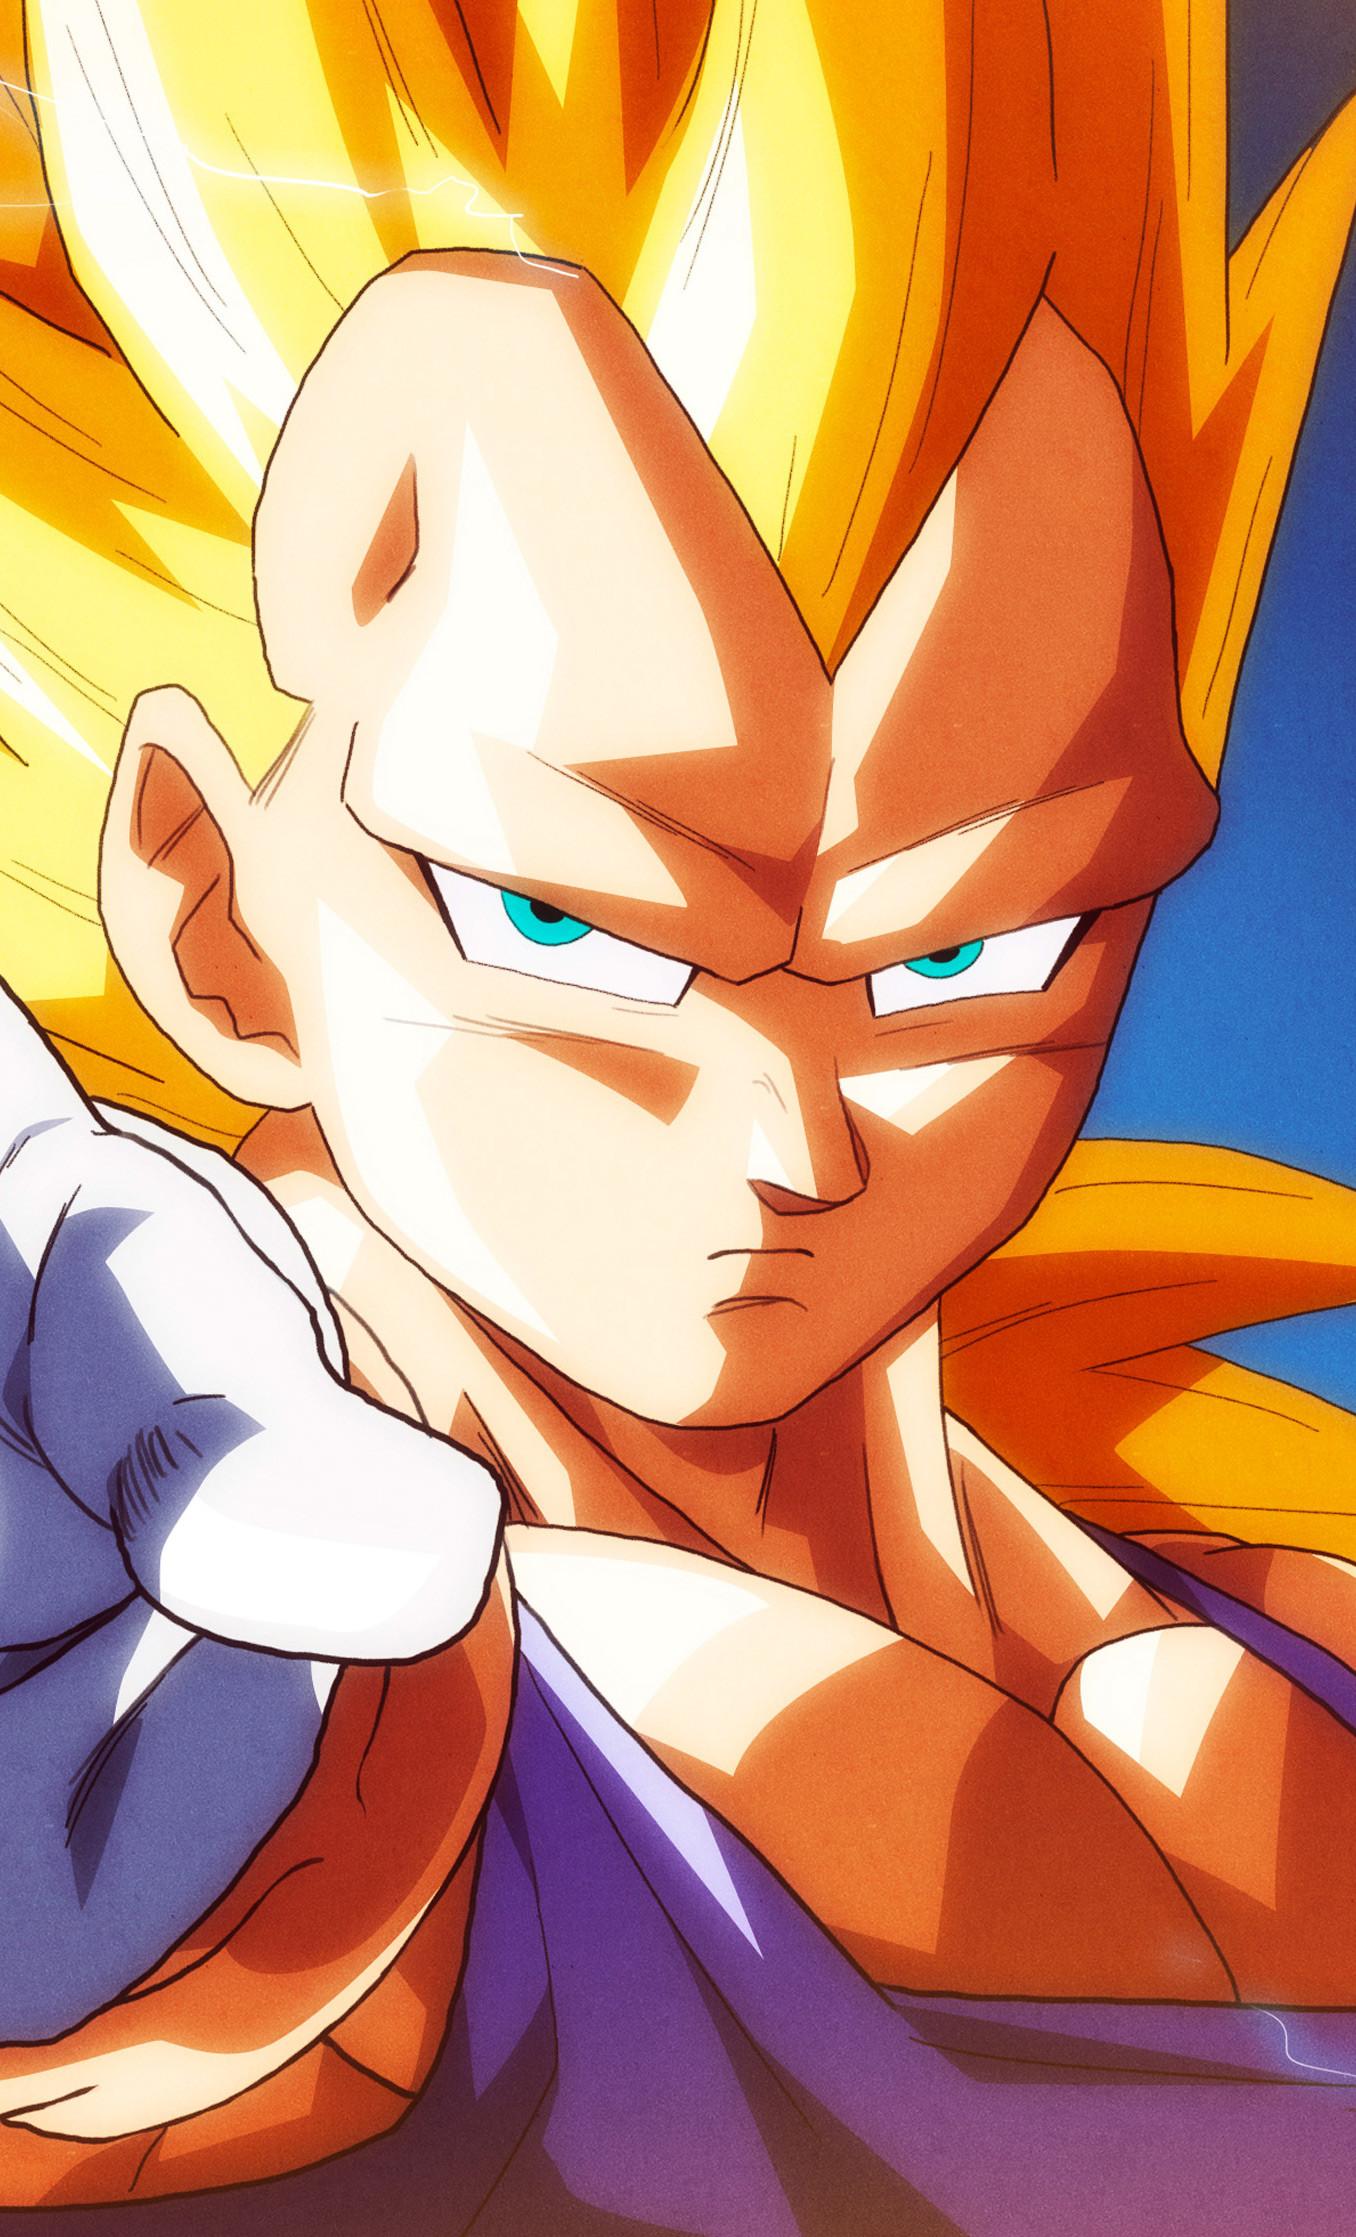 Dragon Ball Z HD Widescreen wallpapers   Dragon Ball Z Vegeta Super Saiyan  Wallpaper http: